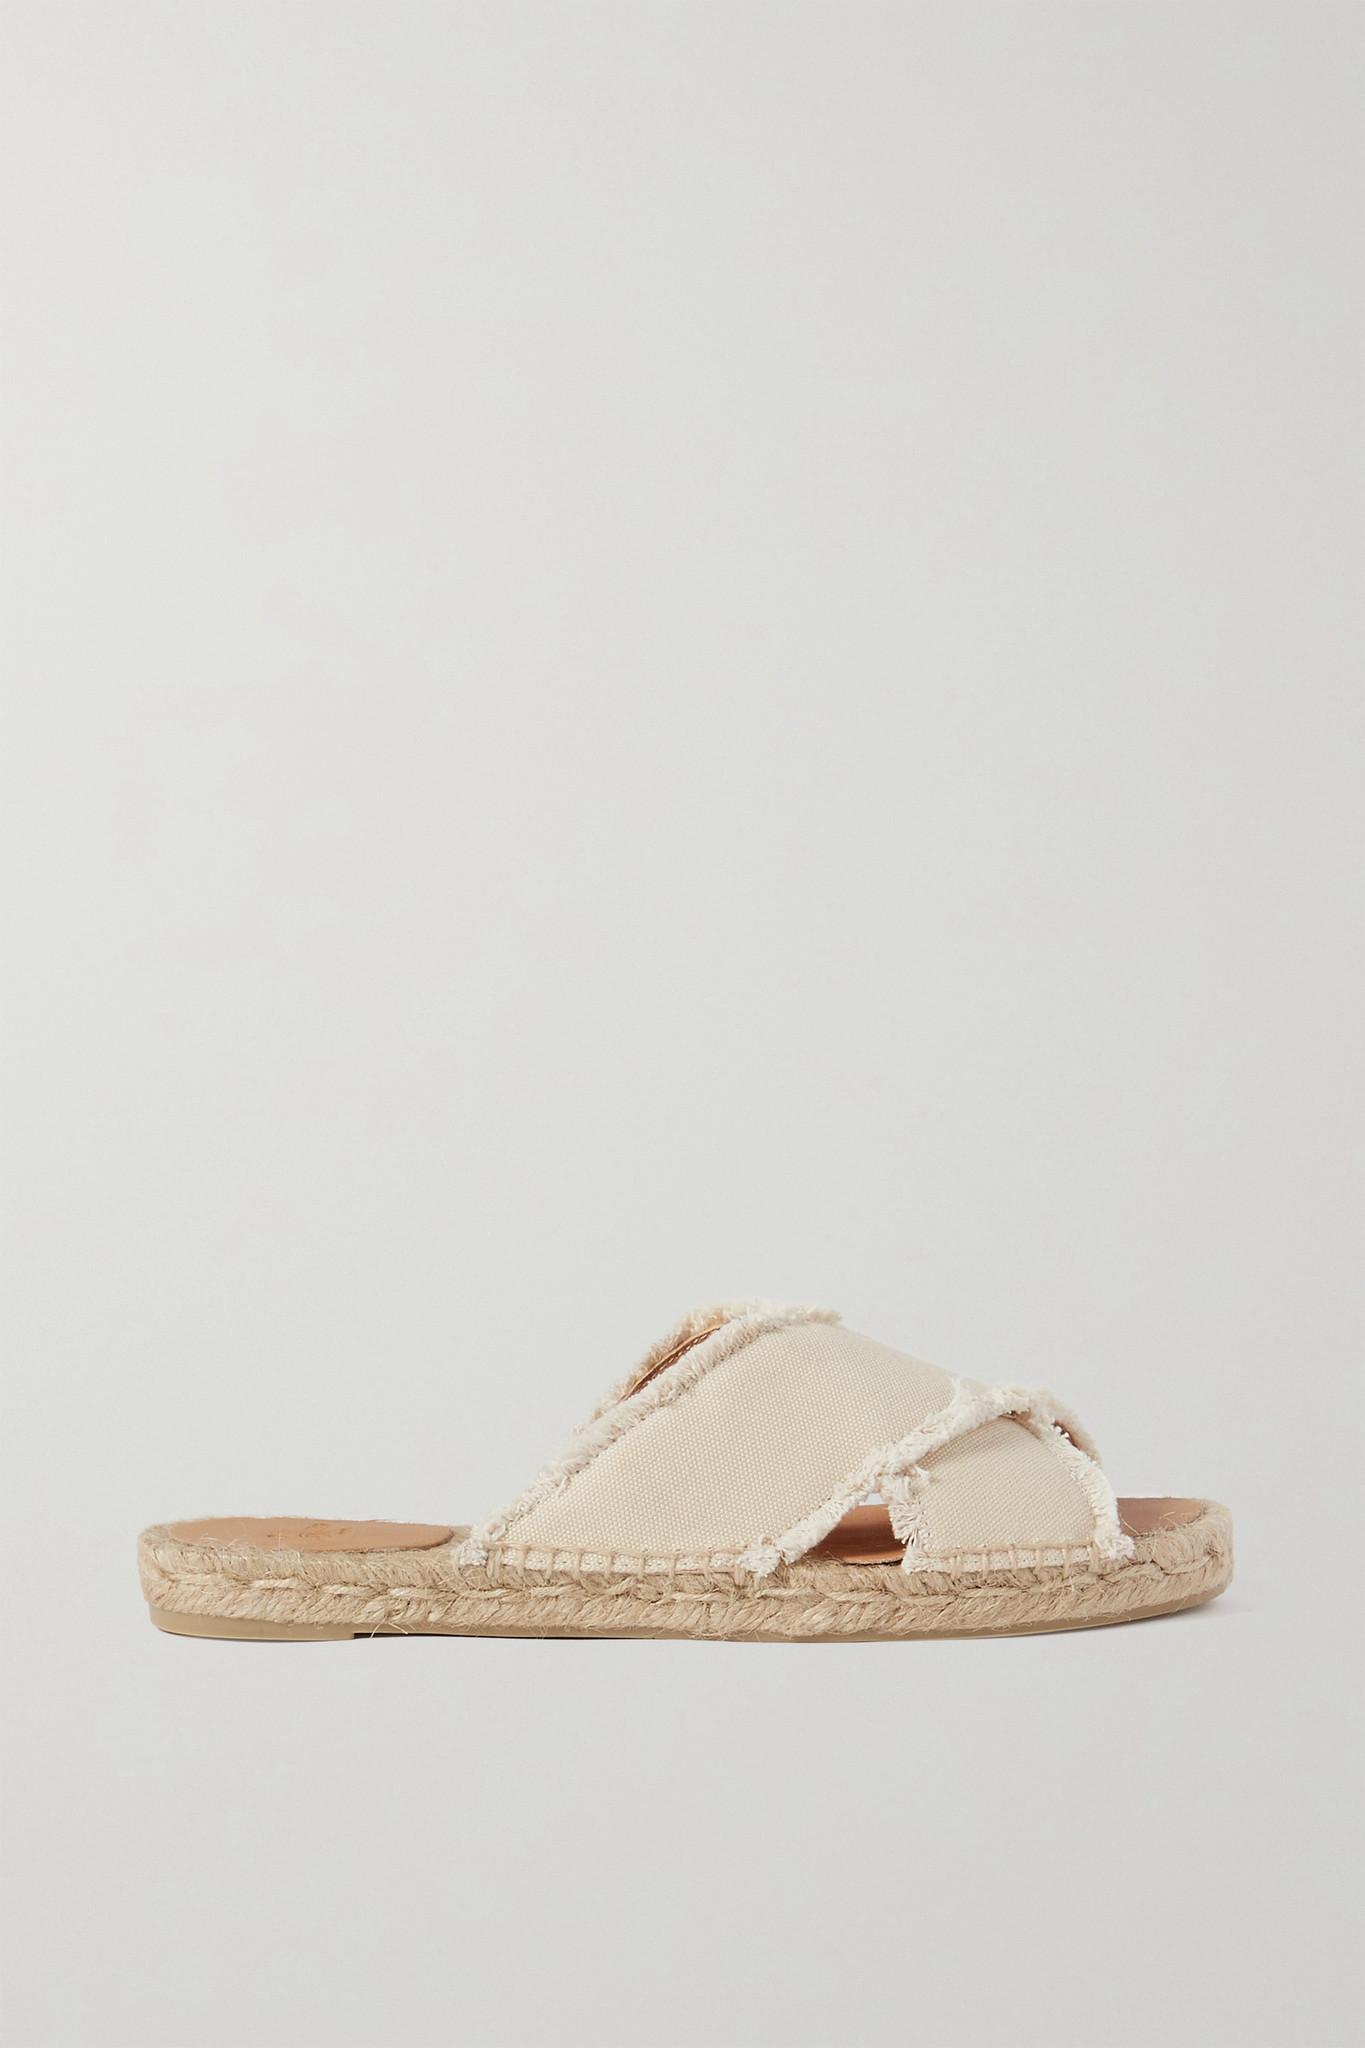 CASTAÑER - Palmera 毛边帆布麻底拖鞋 - 奶油色 - IT35